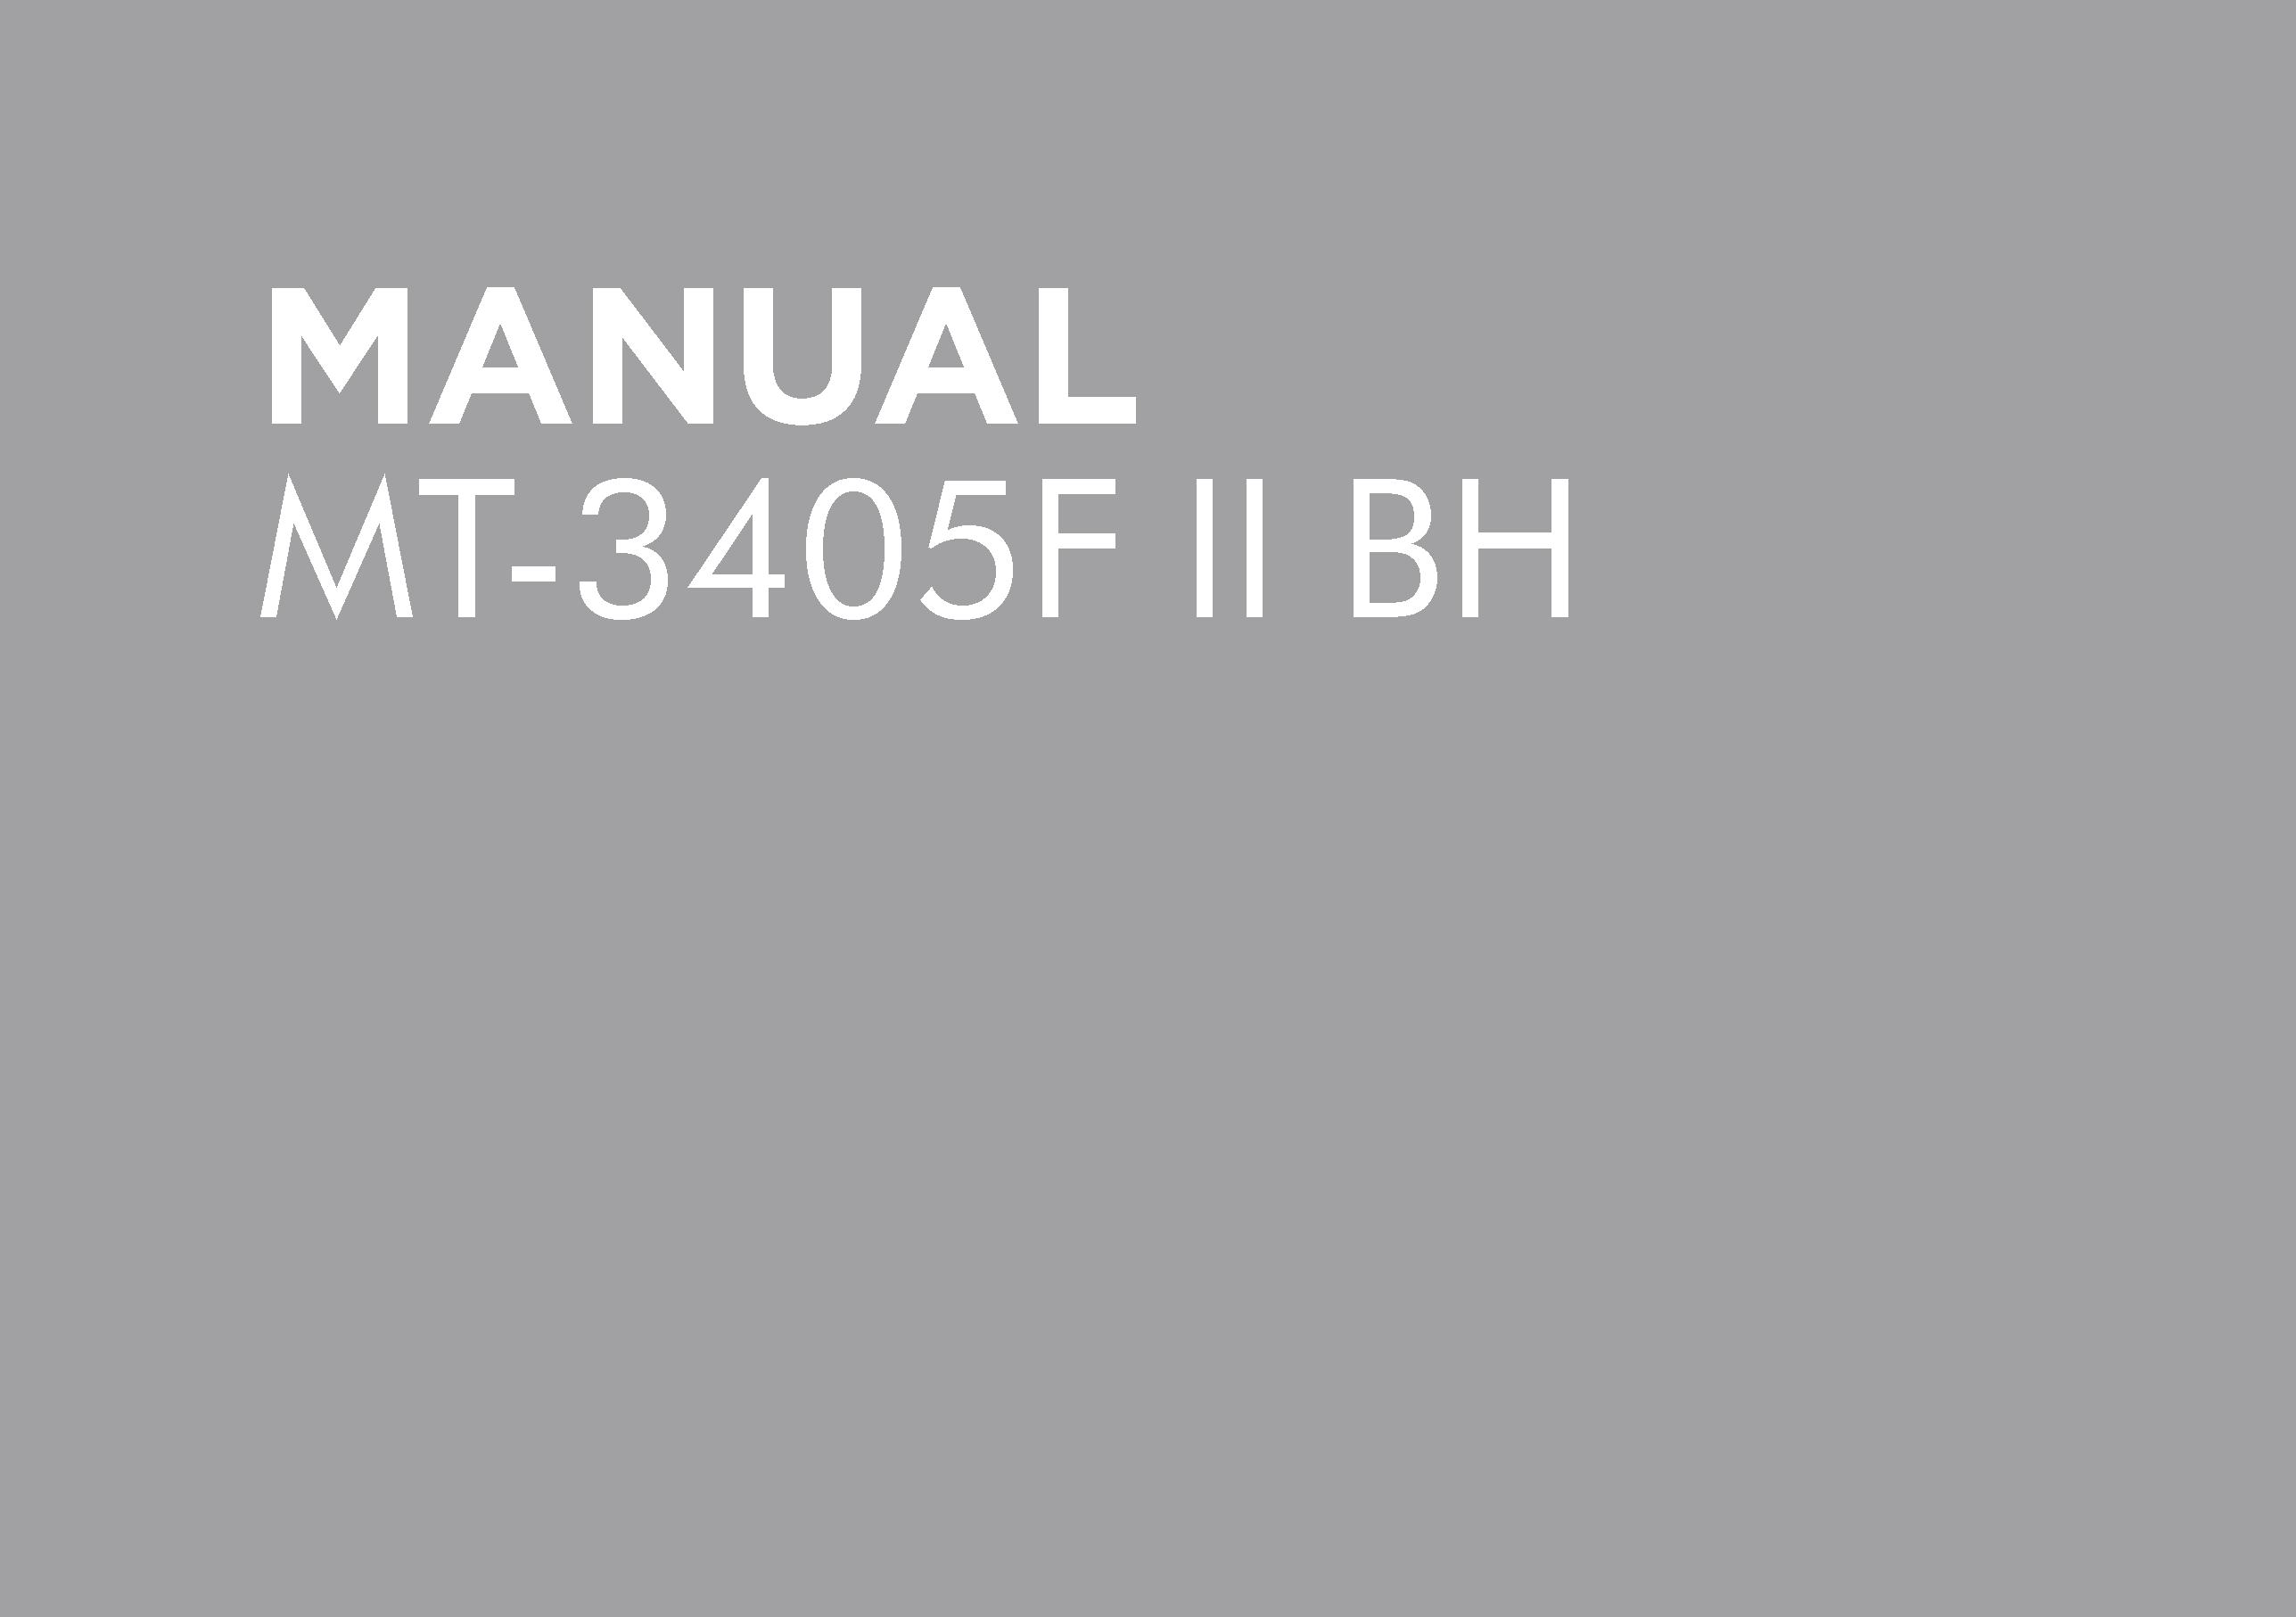 MT-3405F II BH Operators Manual